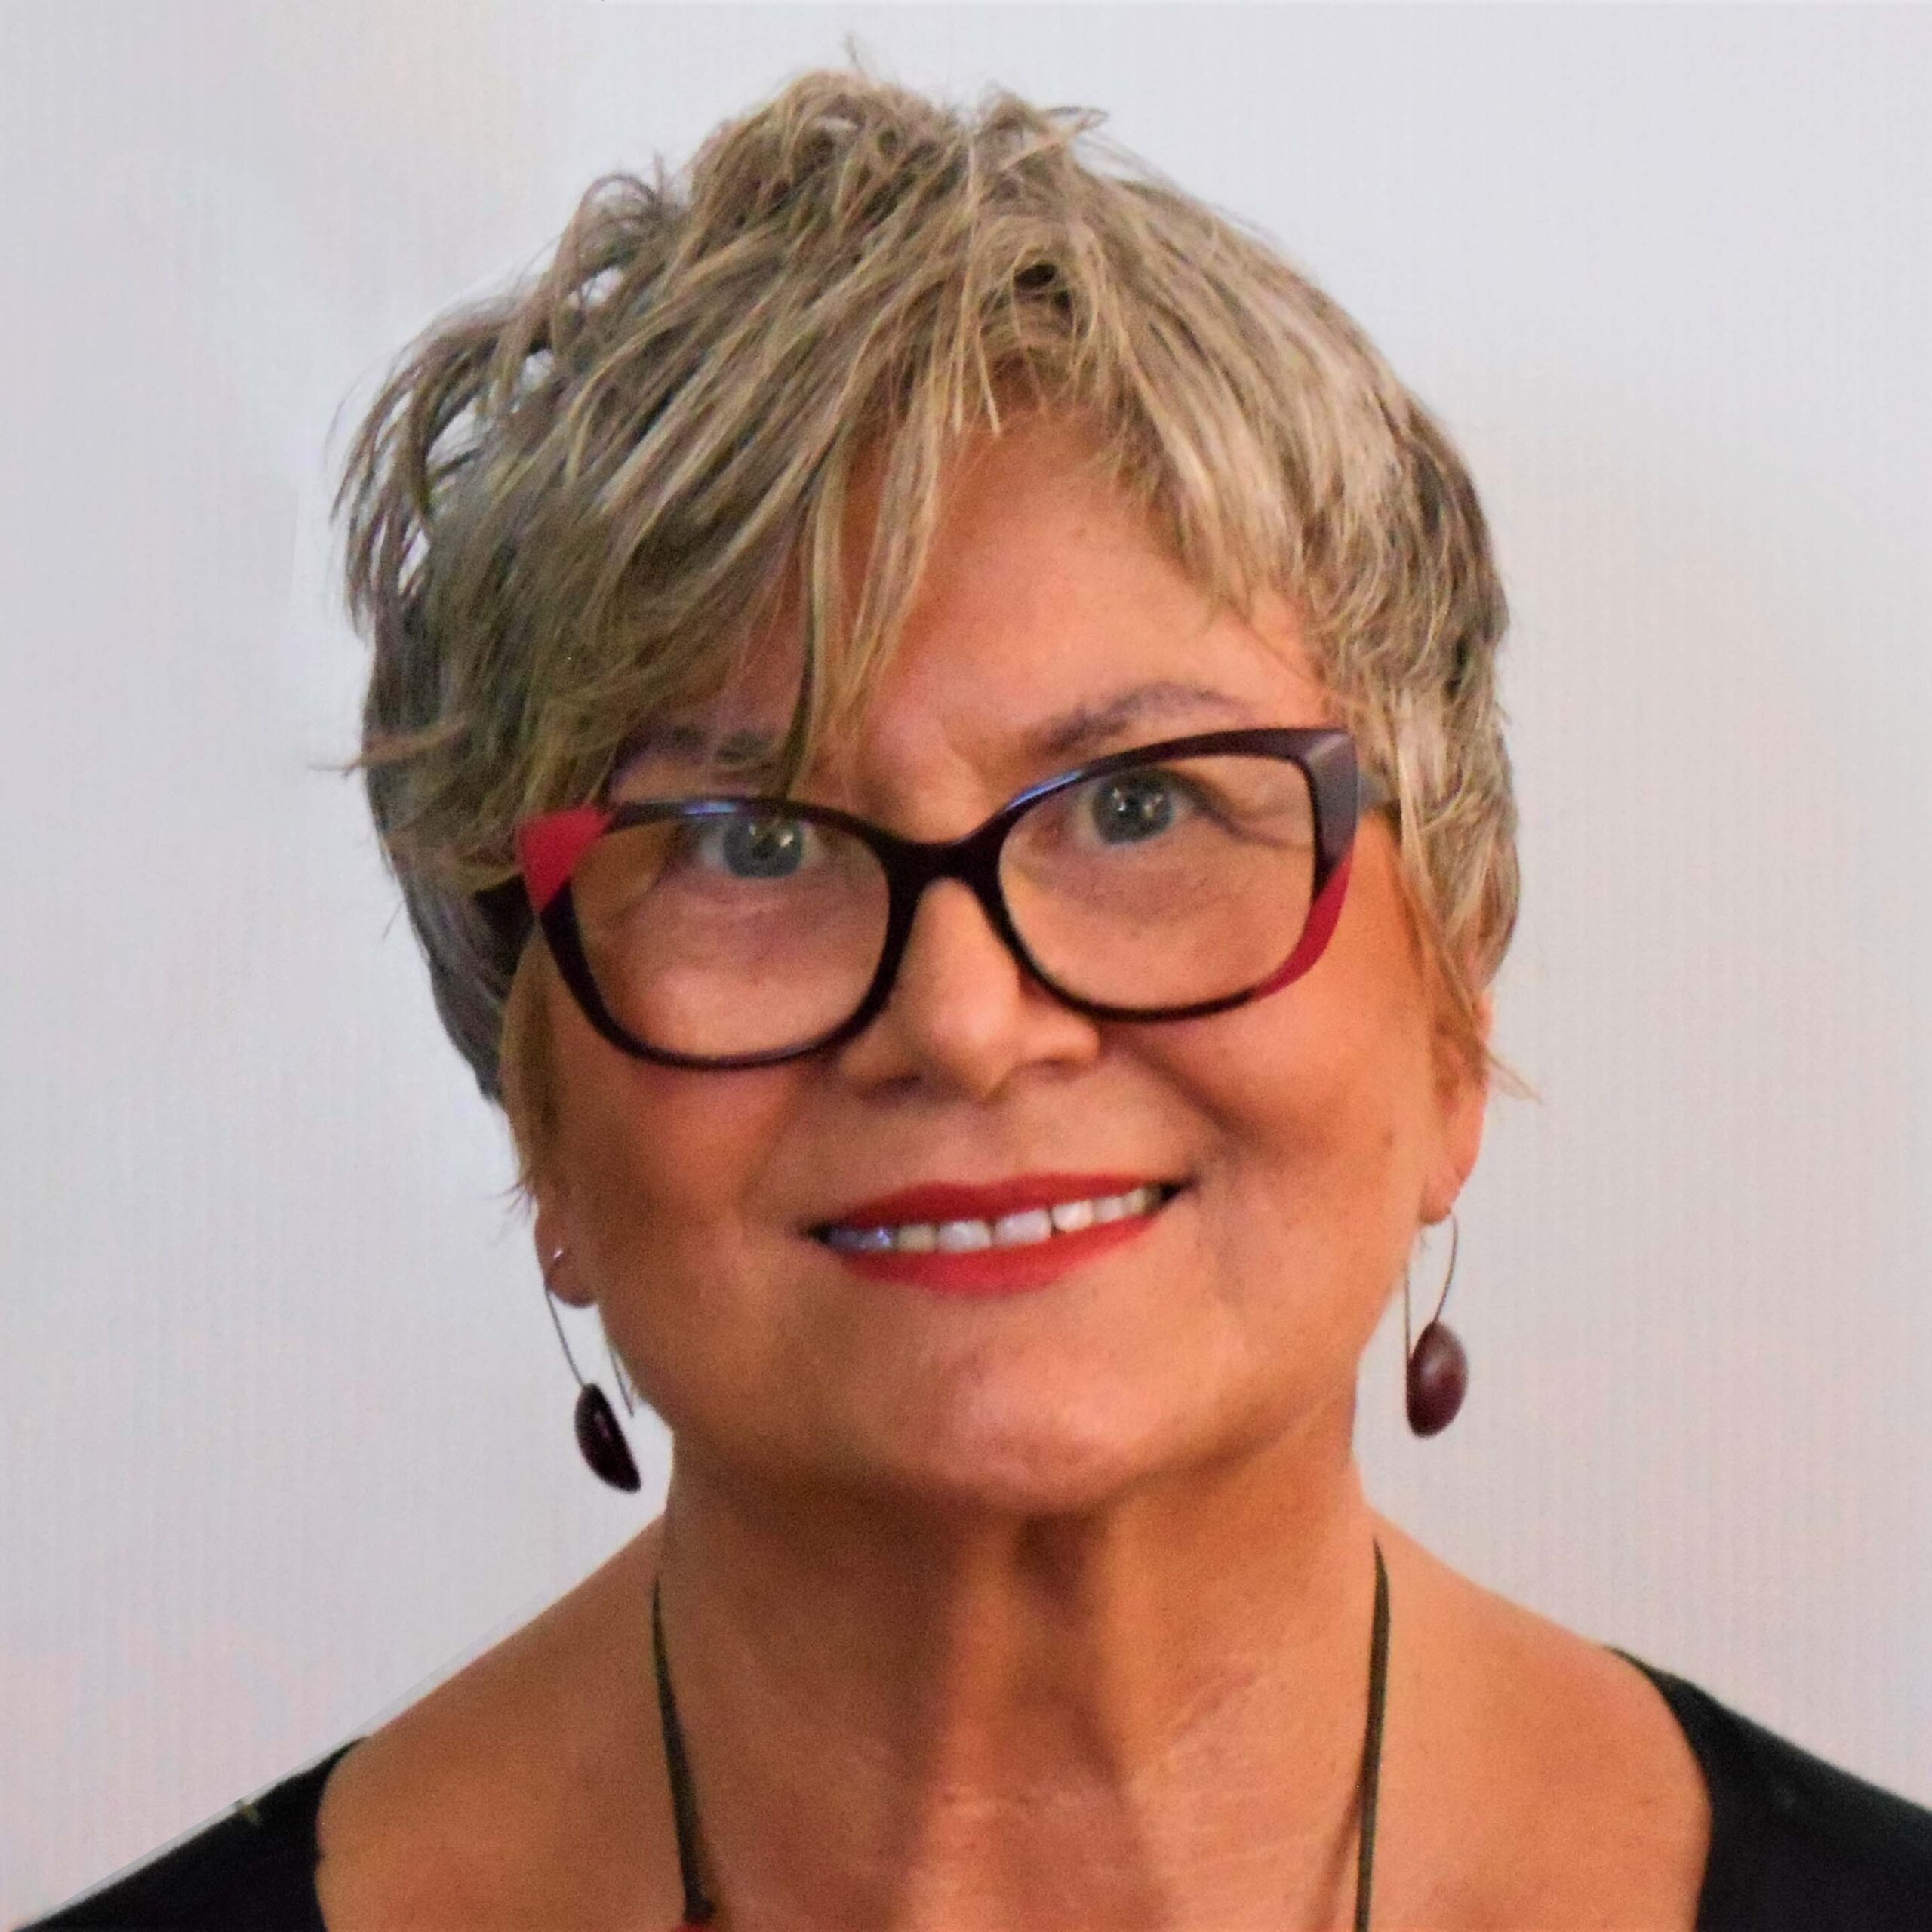 Profile photo of a Elizabeth Szczepanska, lights skin female, 60's, red and black frame glasses and earrings